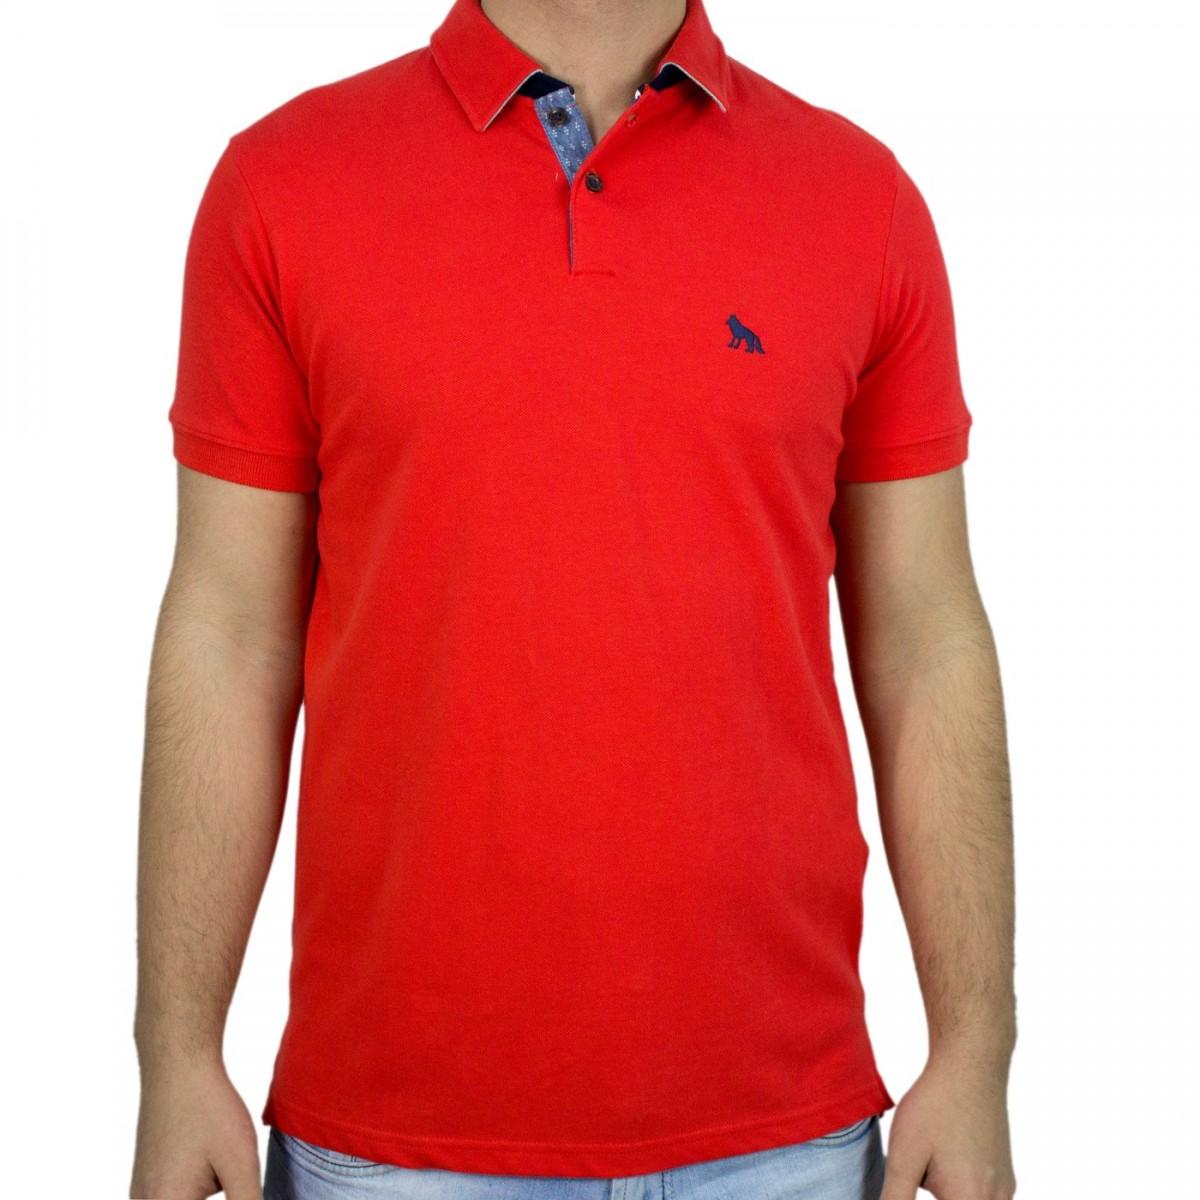 a53cb92fb5ea8 Bizz store camisa polo masculina acostamento manga curta jpg 1200x1200 Acostamento  camisas logo